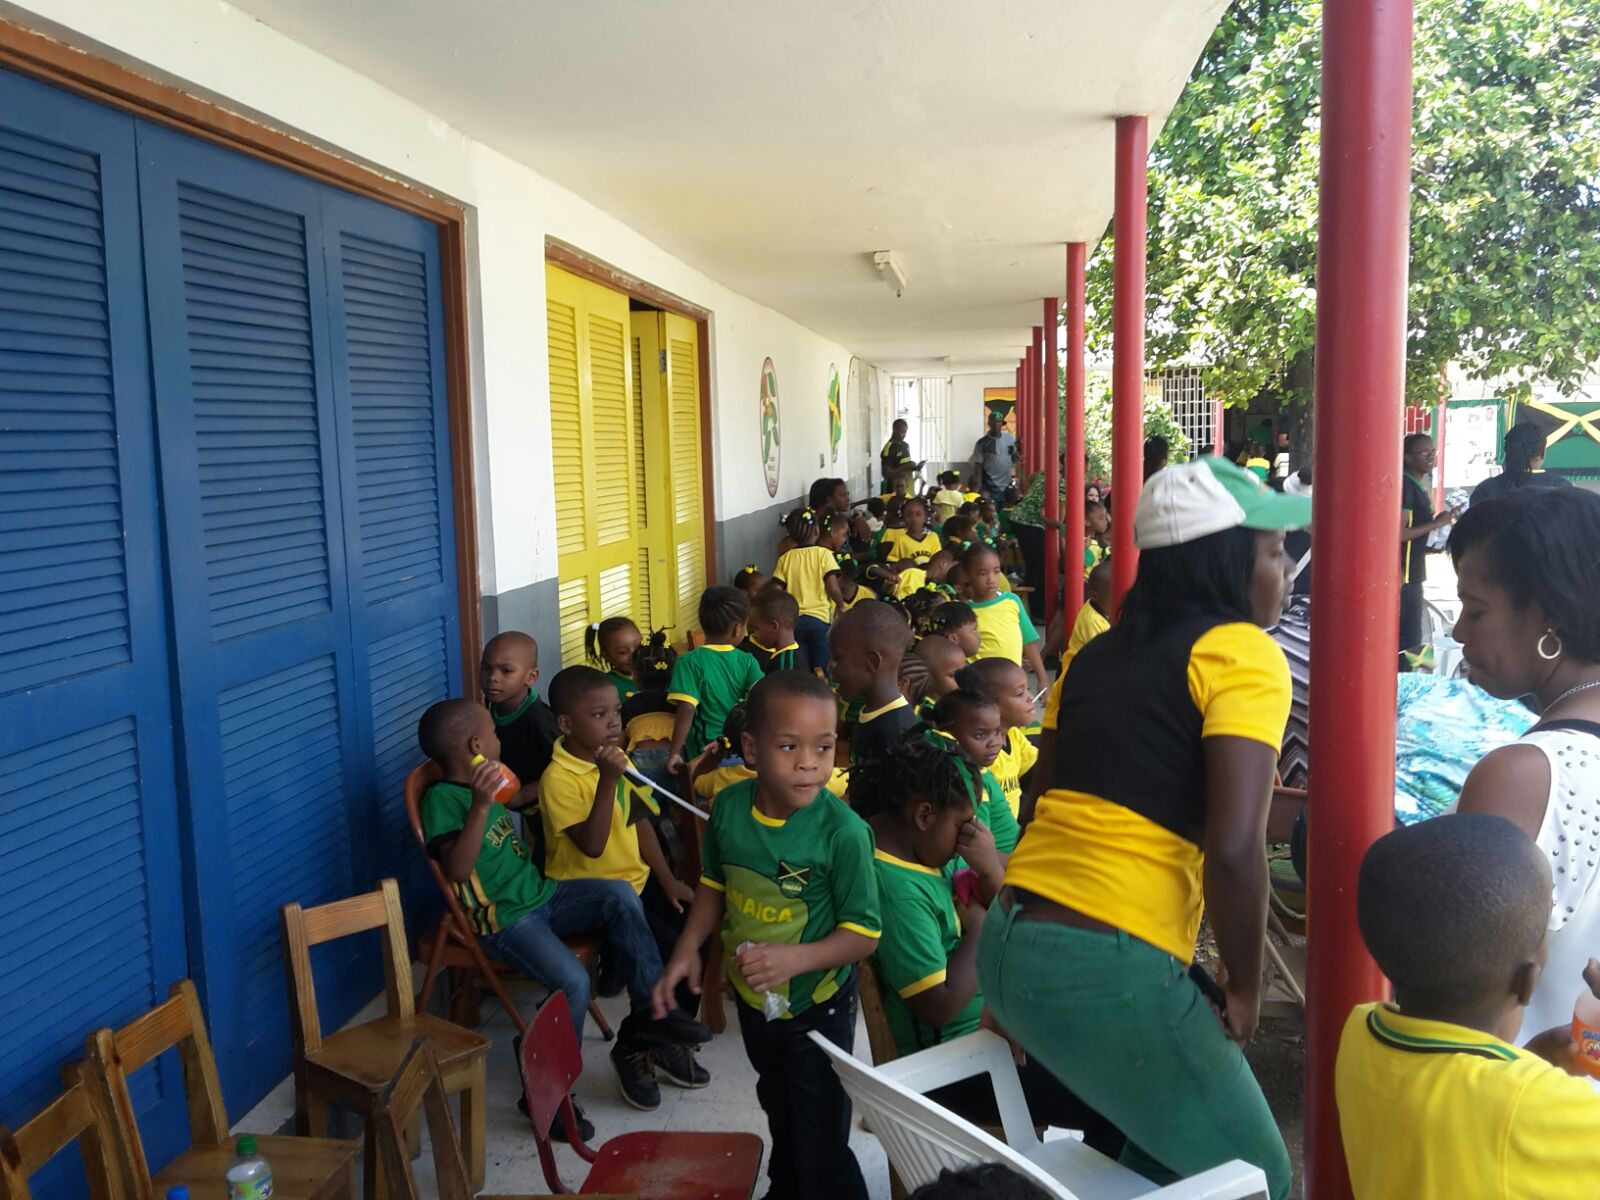 jamaica day 2017